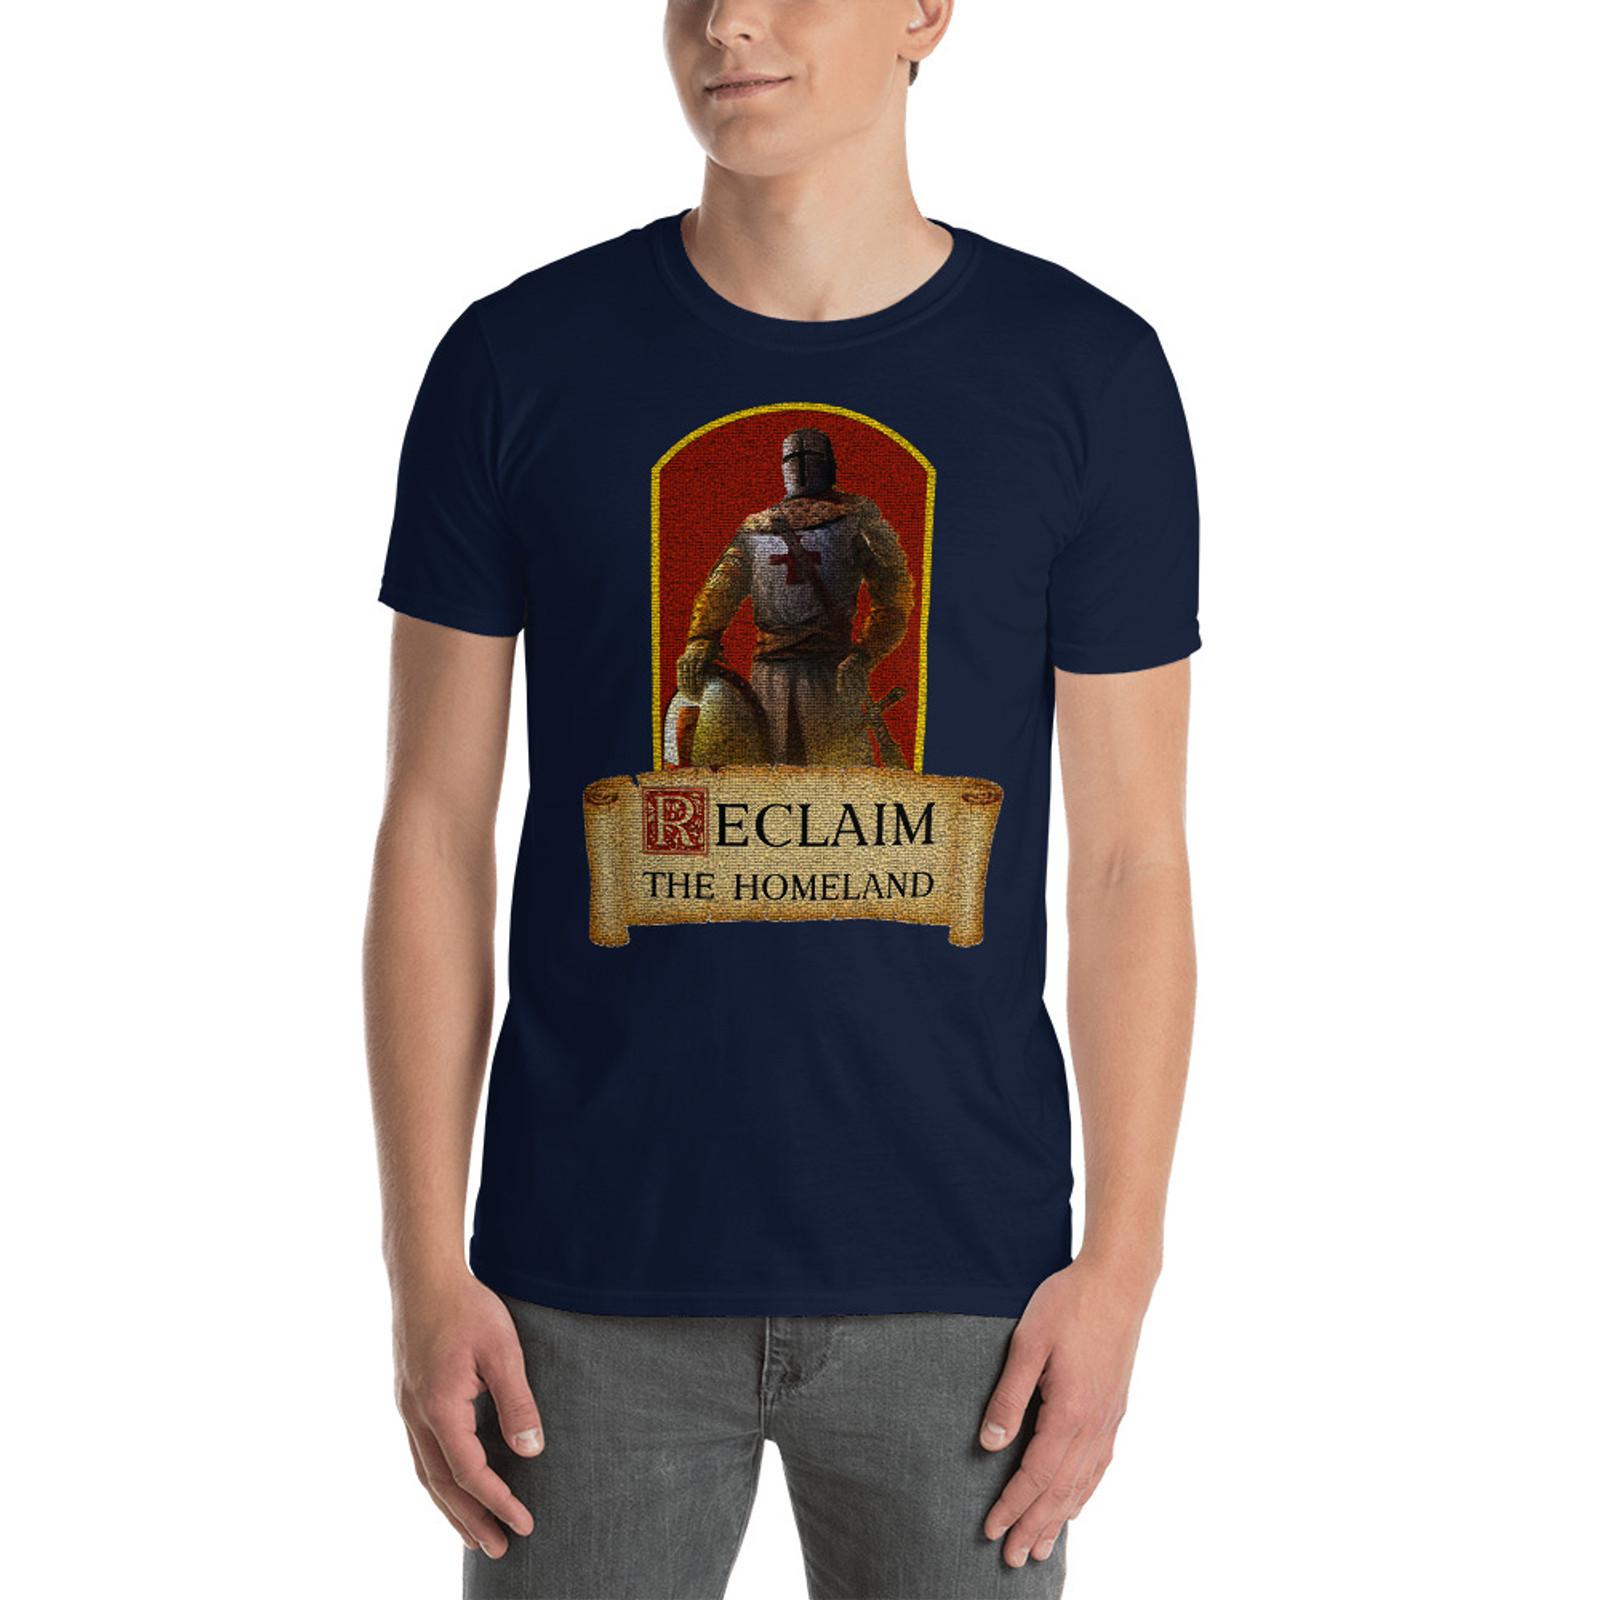 Reclaim The Homeland